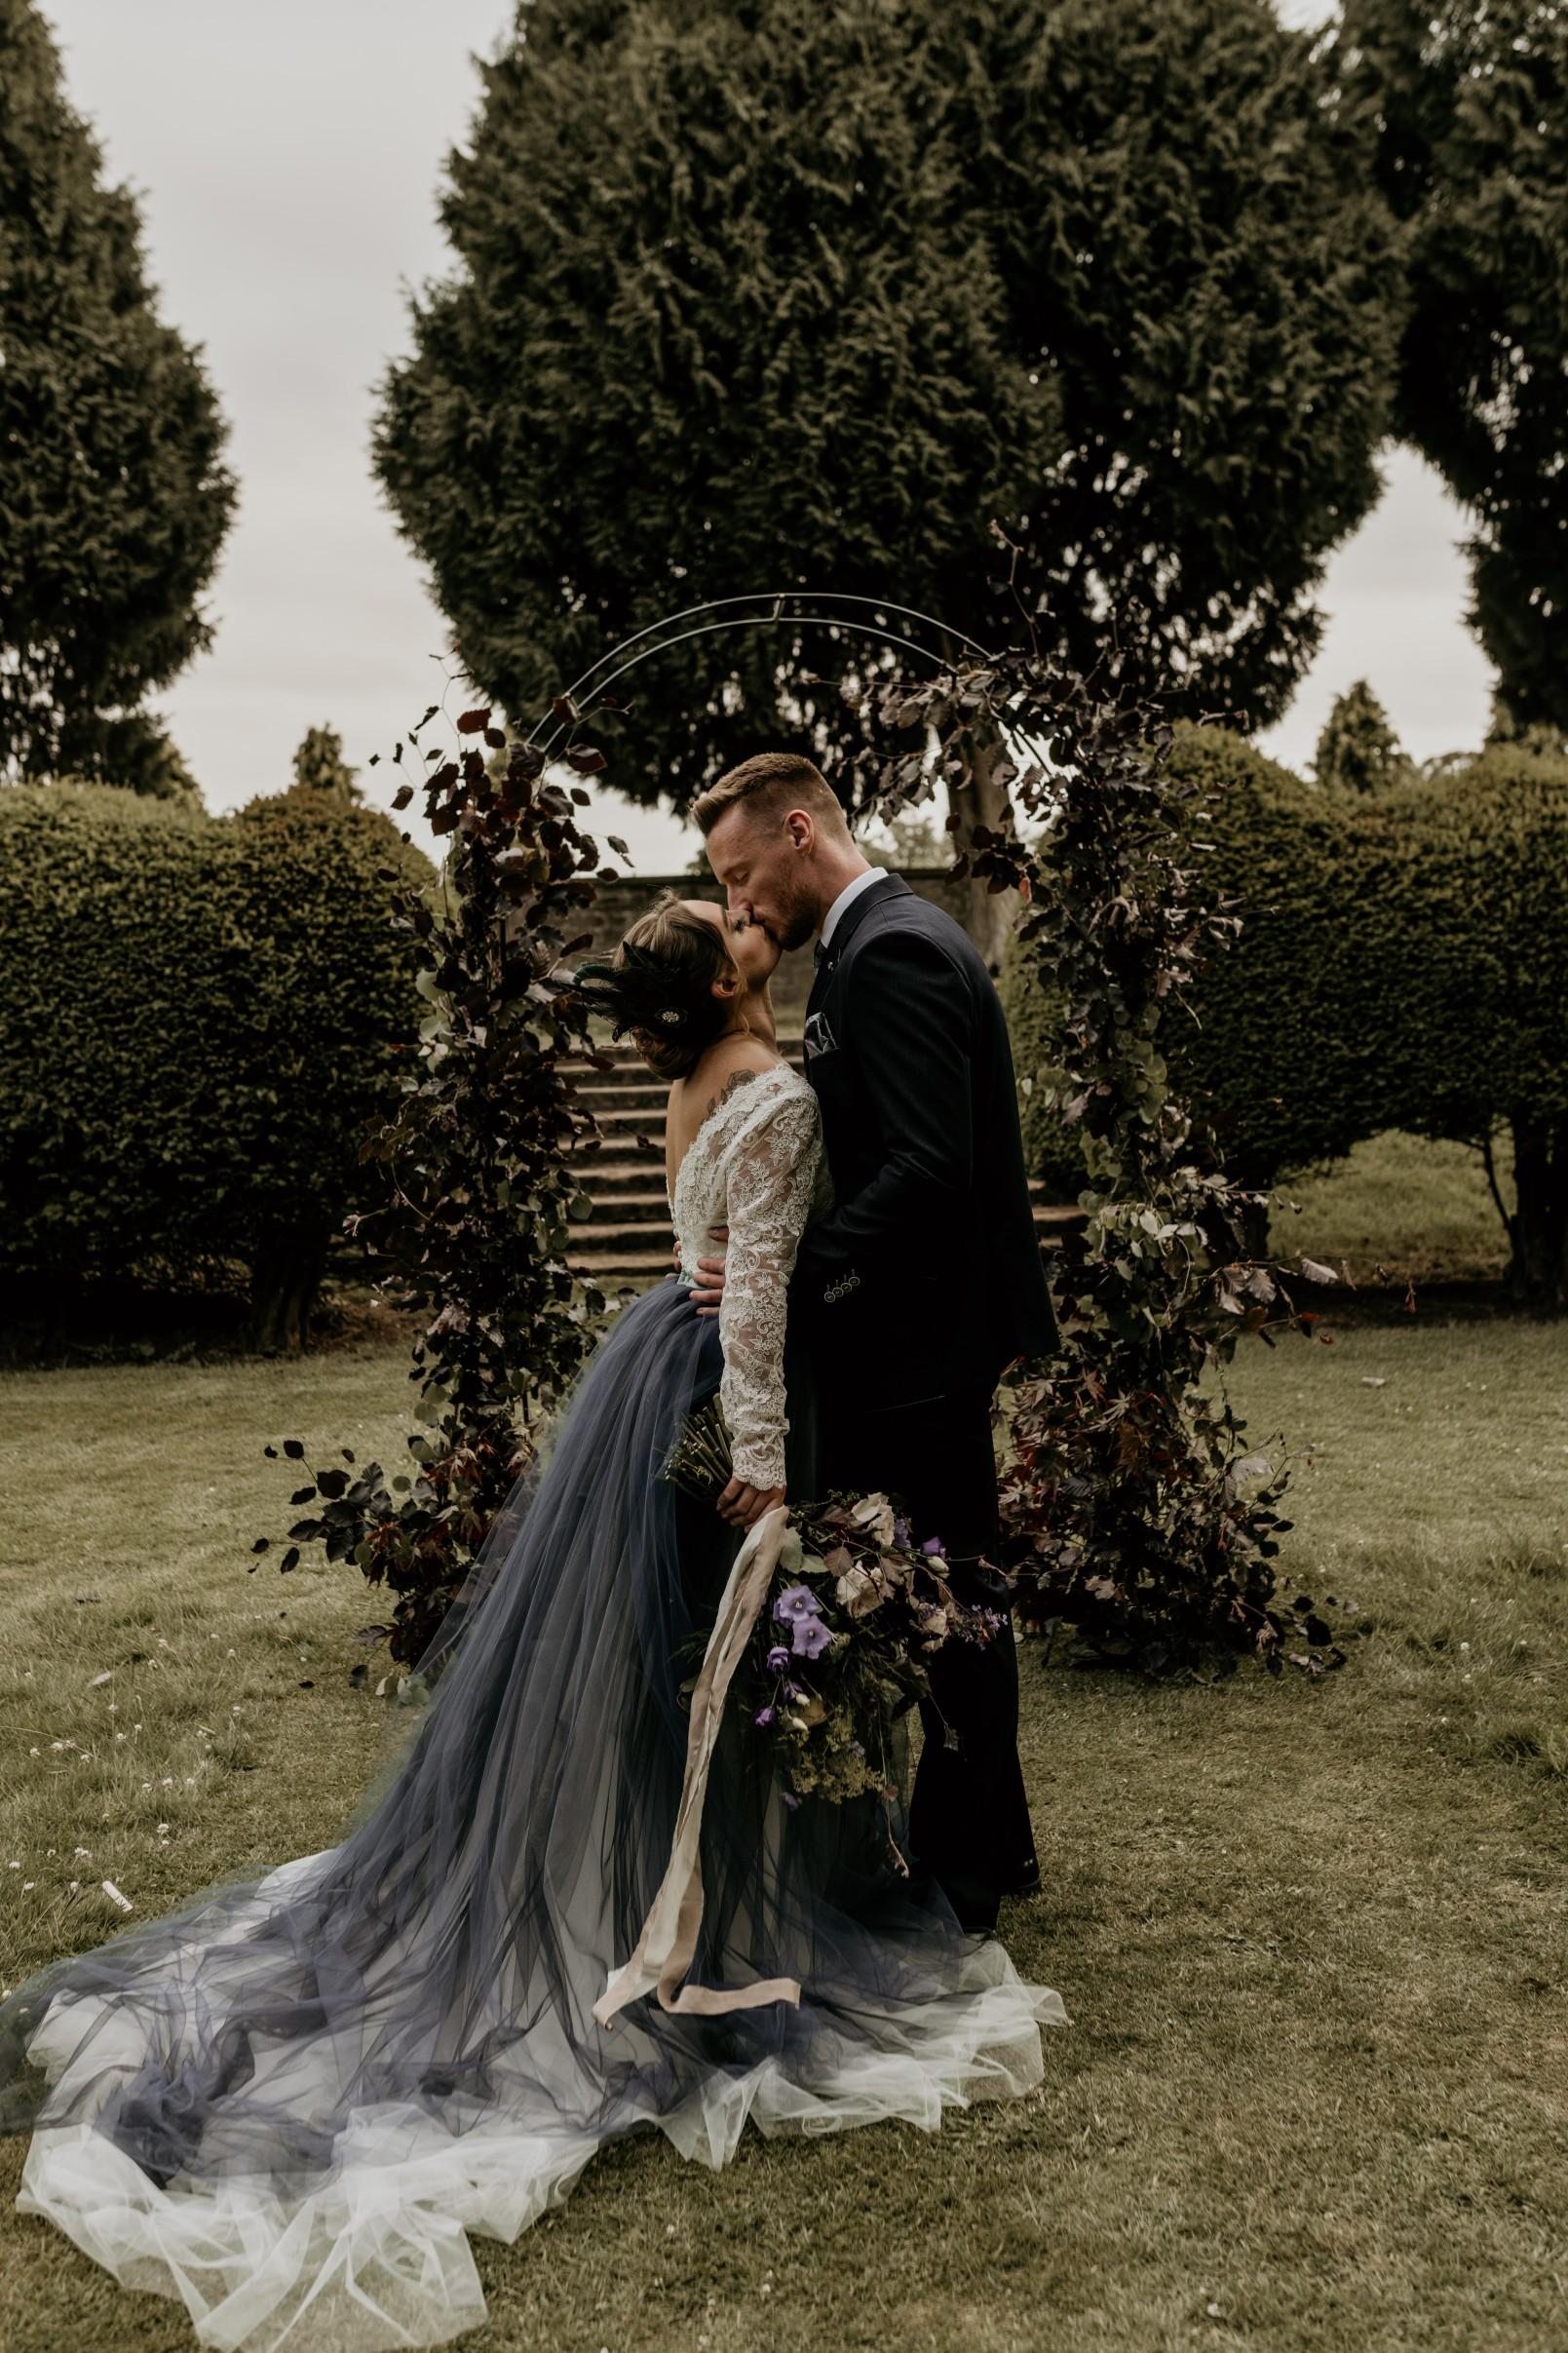 country garden wedding at newstead abbey - unique wedding ceremony - coloured wedding dress - alternative wedding dress